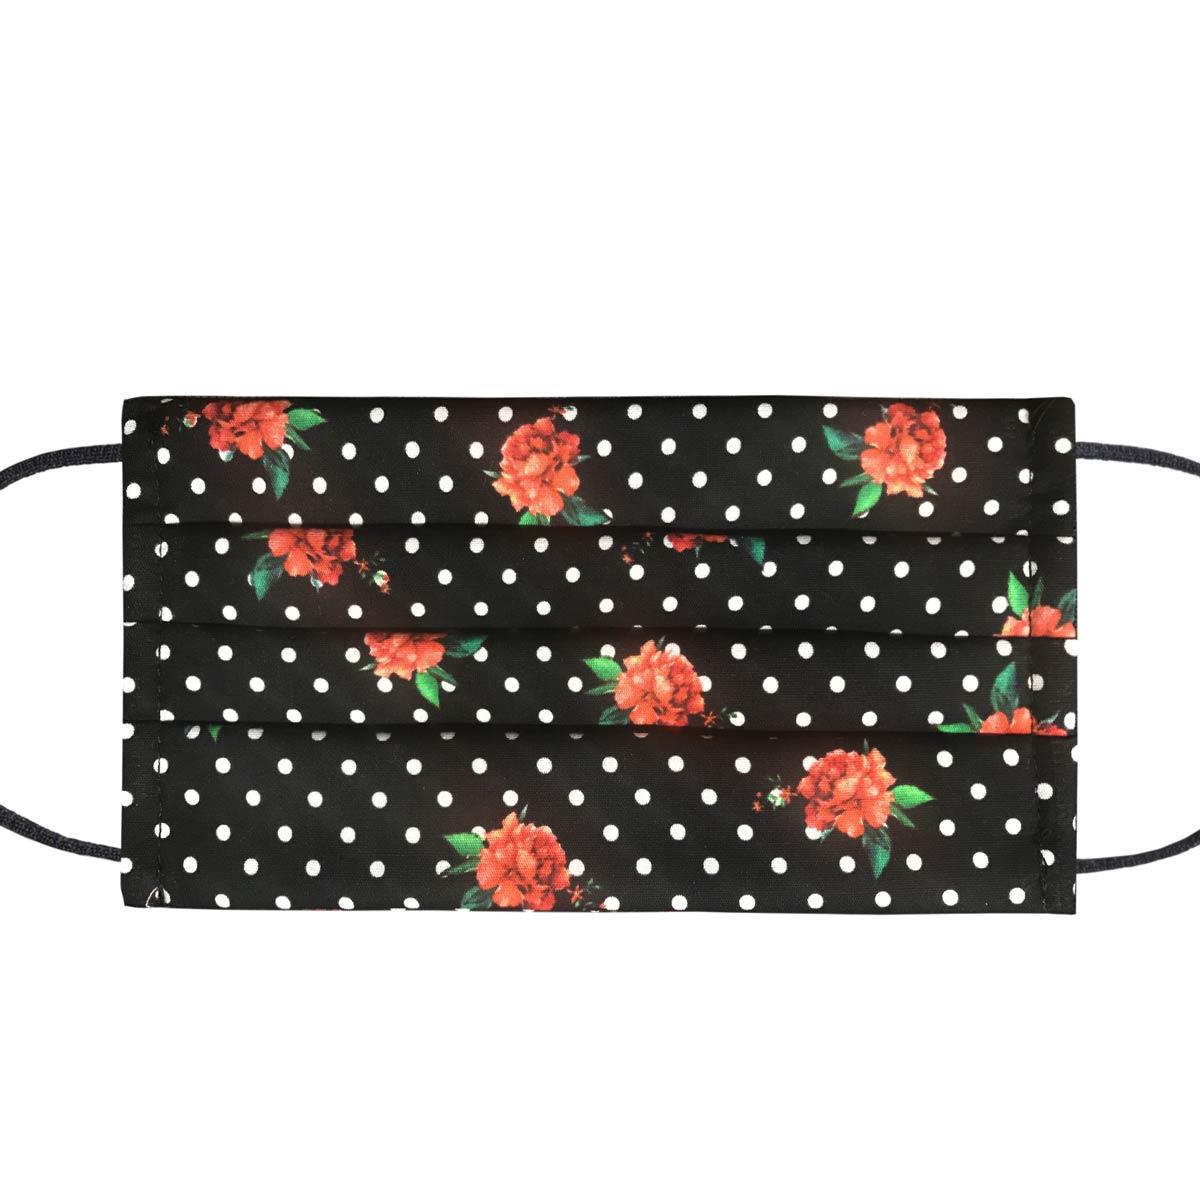 AT-06291-F12-masque-lavable-roses-noir